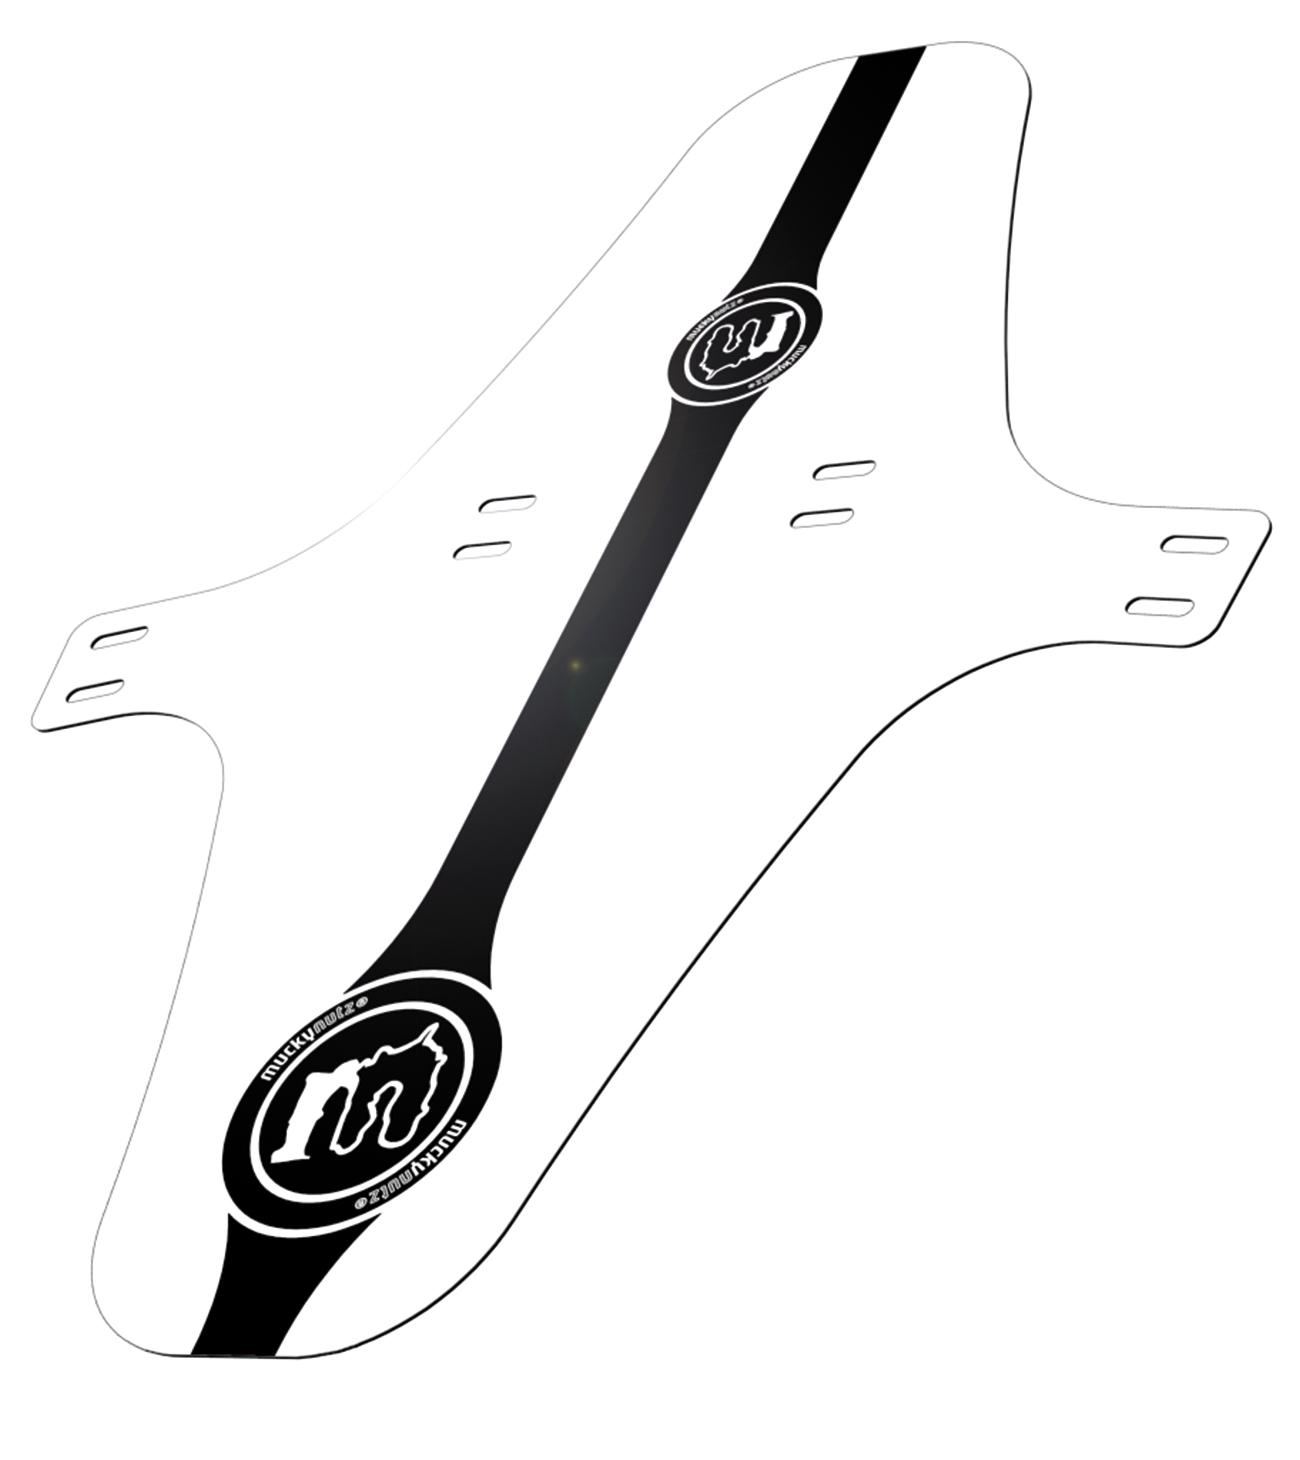 Garde-boue avant Mucky Nutz Face Fender XL Blanc/Noir